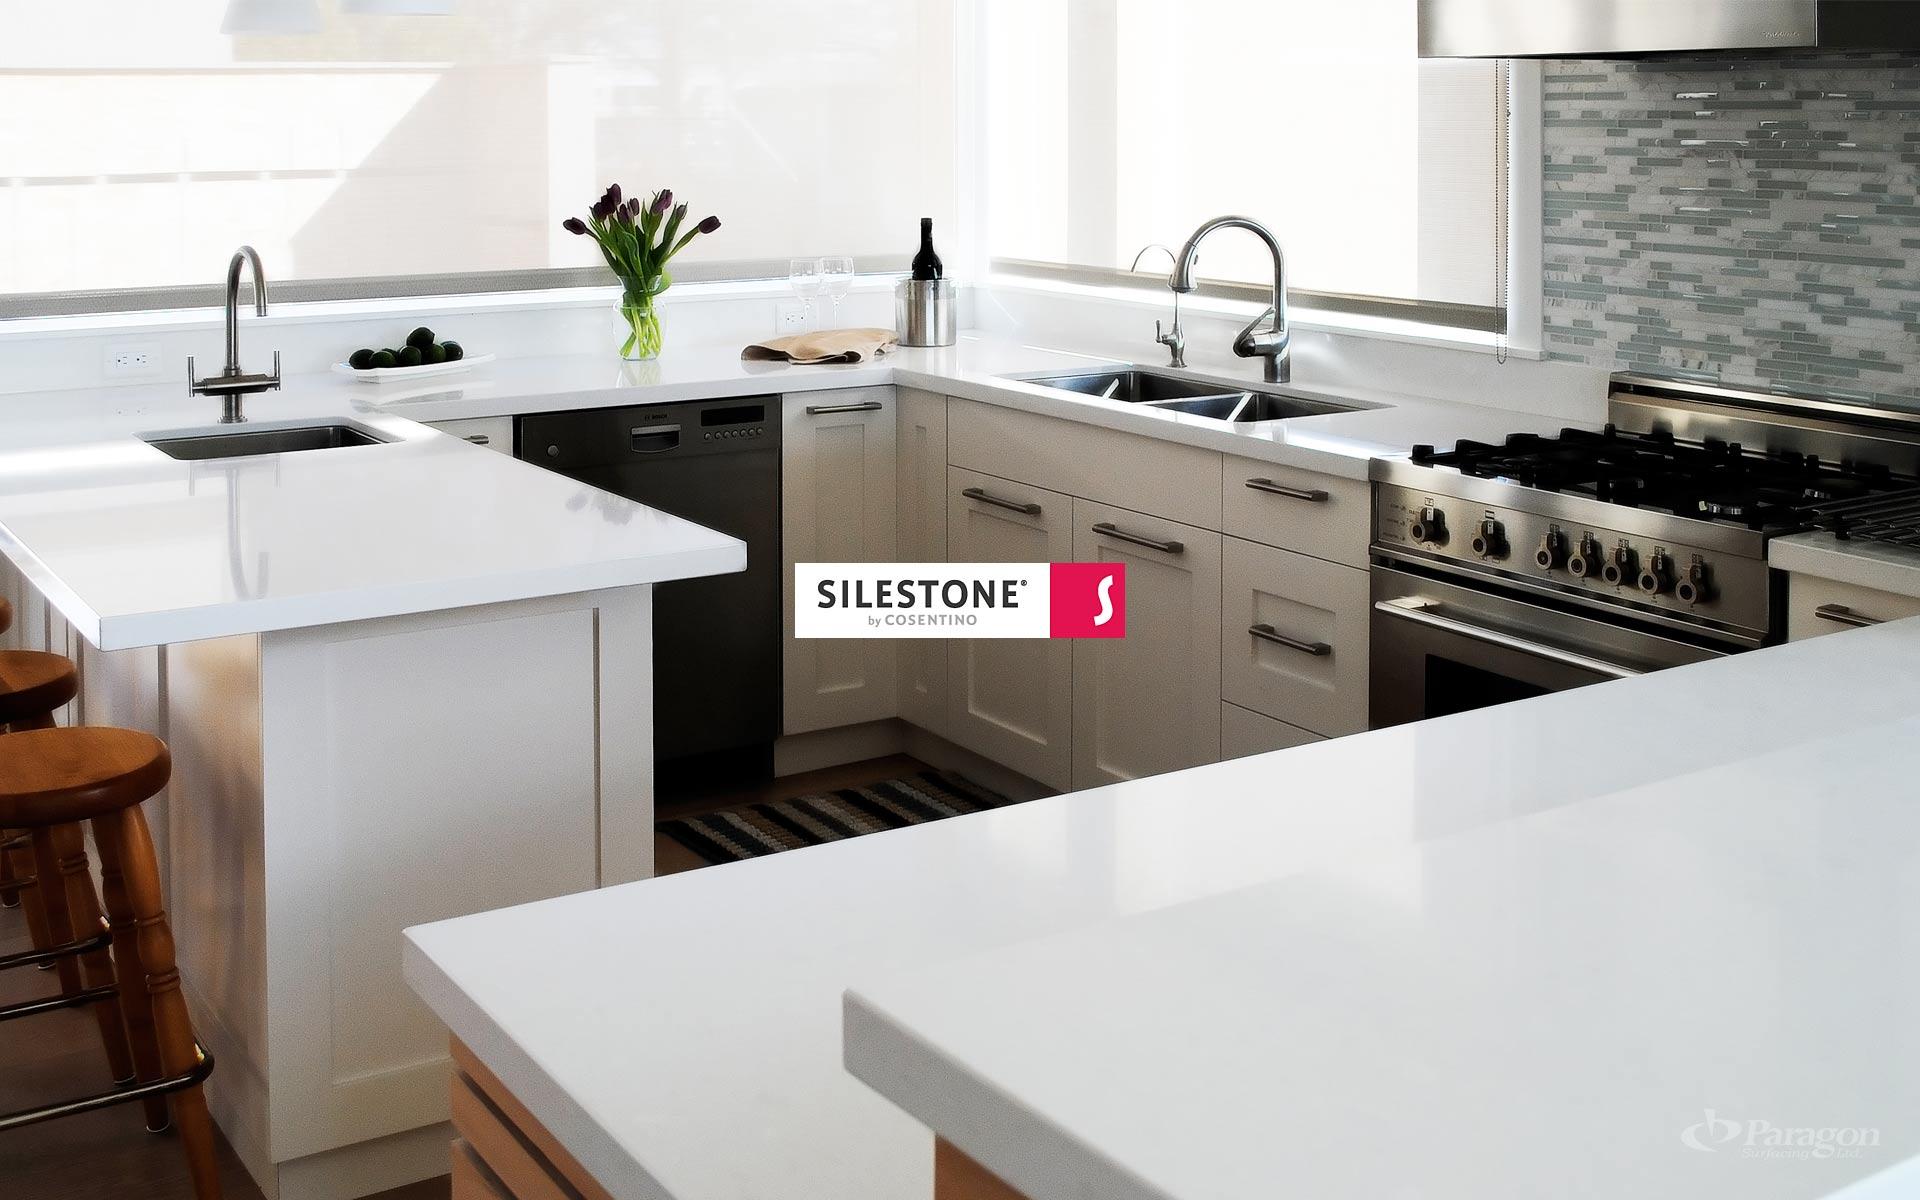 Silestone Quartz Countertops Vancouver, Richmond & Kelowna